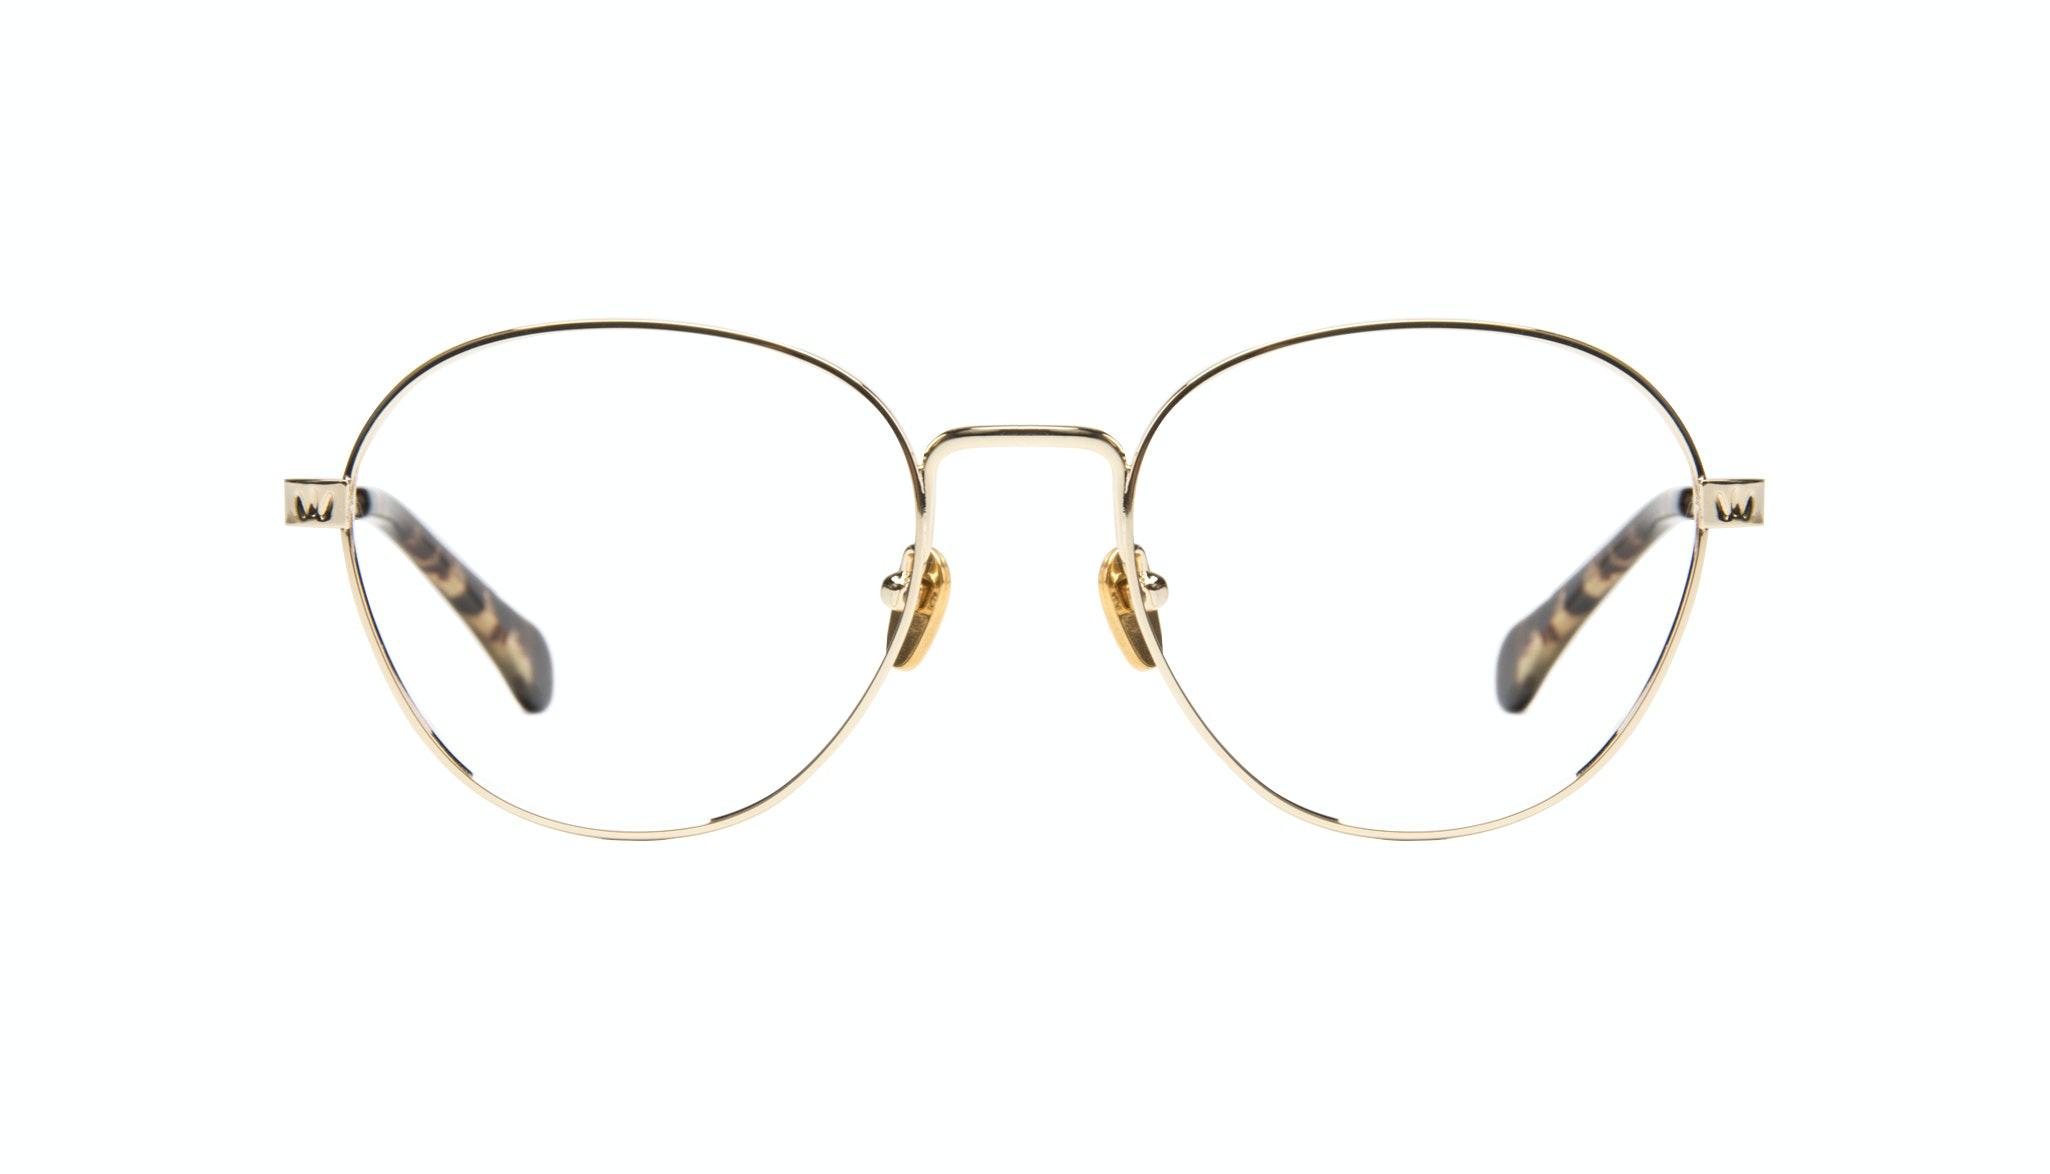 Affordable Fashion Glasses Round Eyeglasses Women Brace gold Front